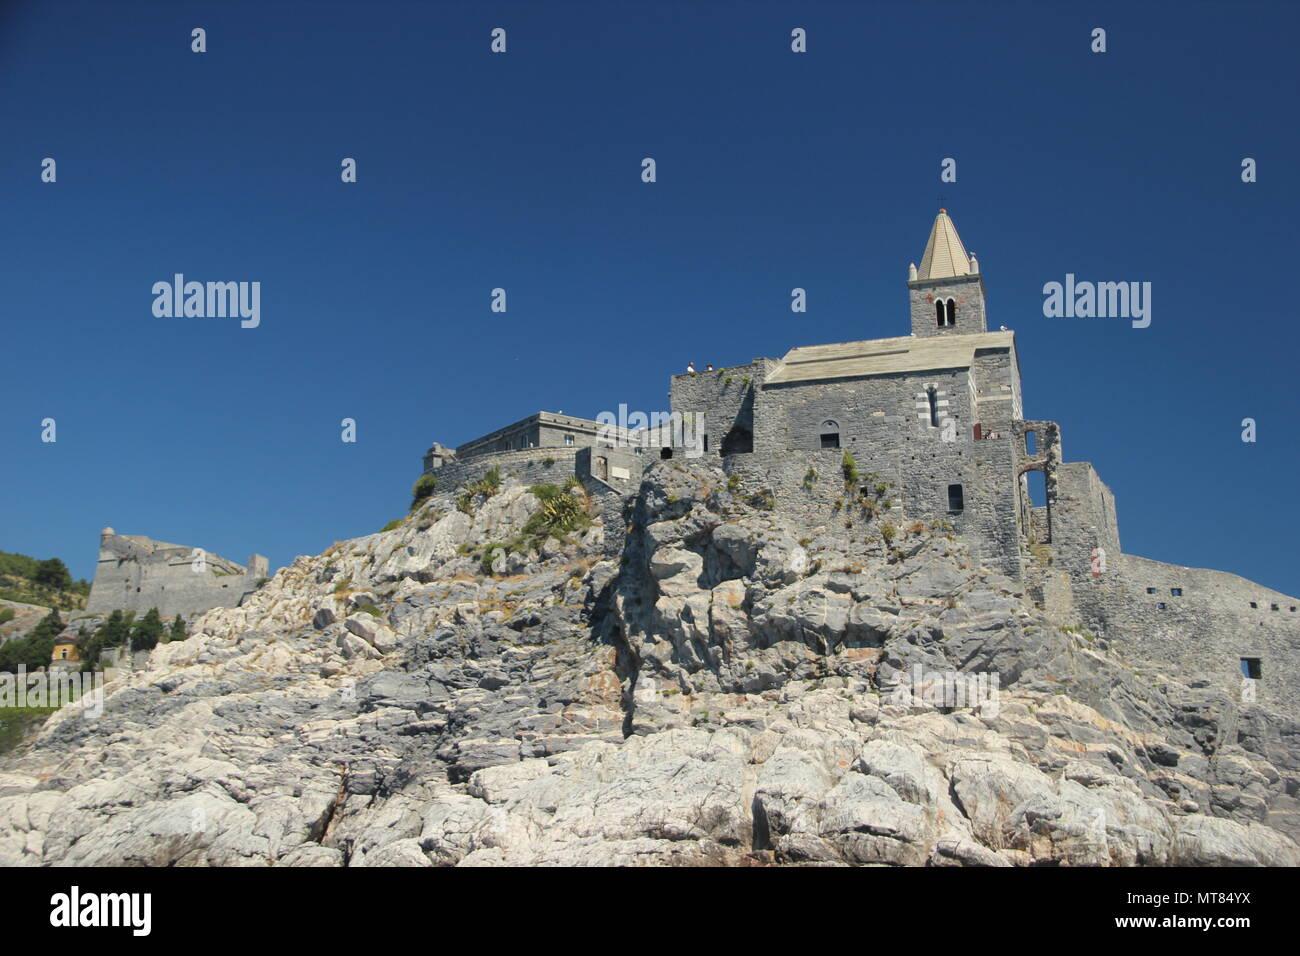 Church of St Peter in Lazzaro Spallanzani, Portovenere, Italy Stock Photo